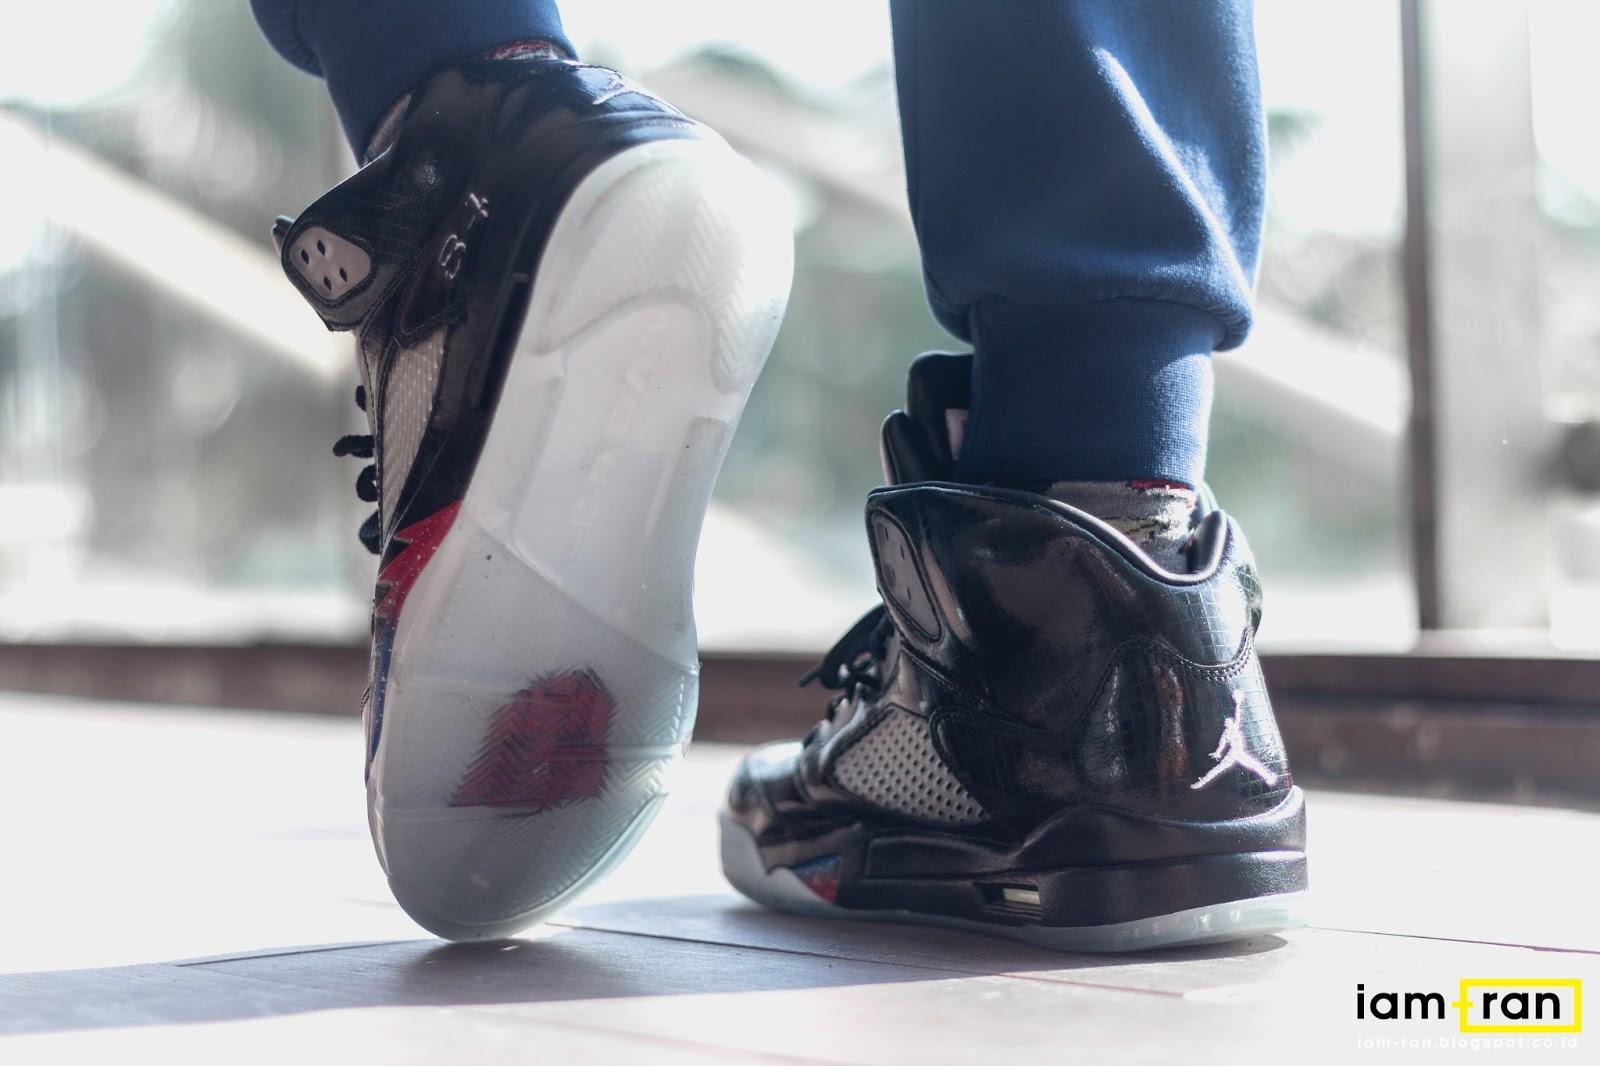 ca2568d84b4f ON FEET   Winston - Nike Air Jordan 5 X Mark Wahlberg X Transformer.  Winston on feet. Sneakers   Nike Air Jordan 5 x Mark Wahlberg x Transformer